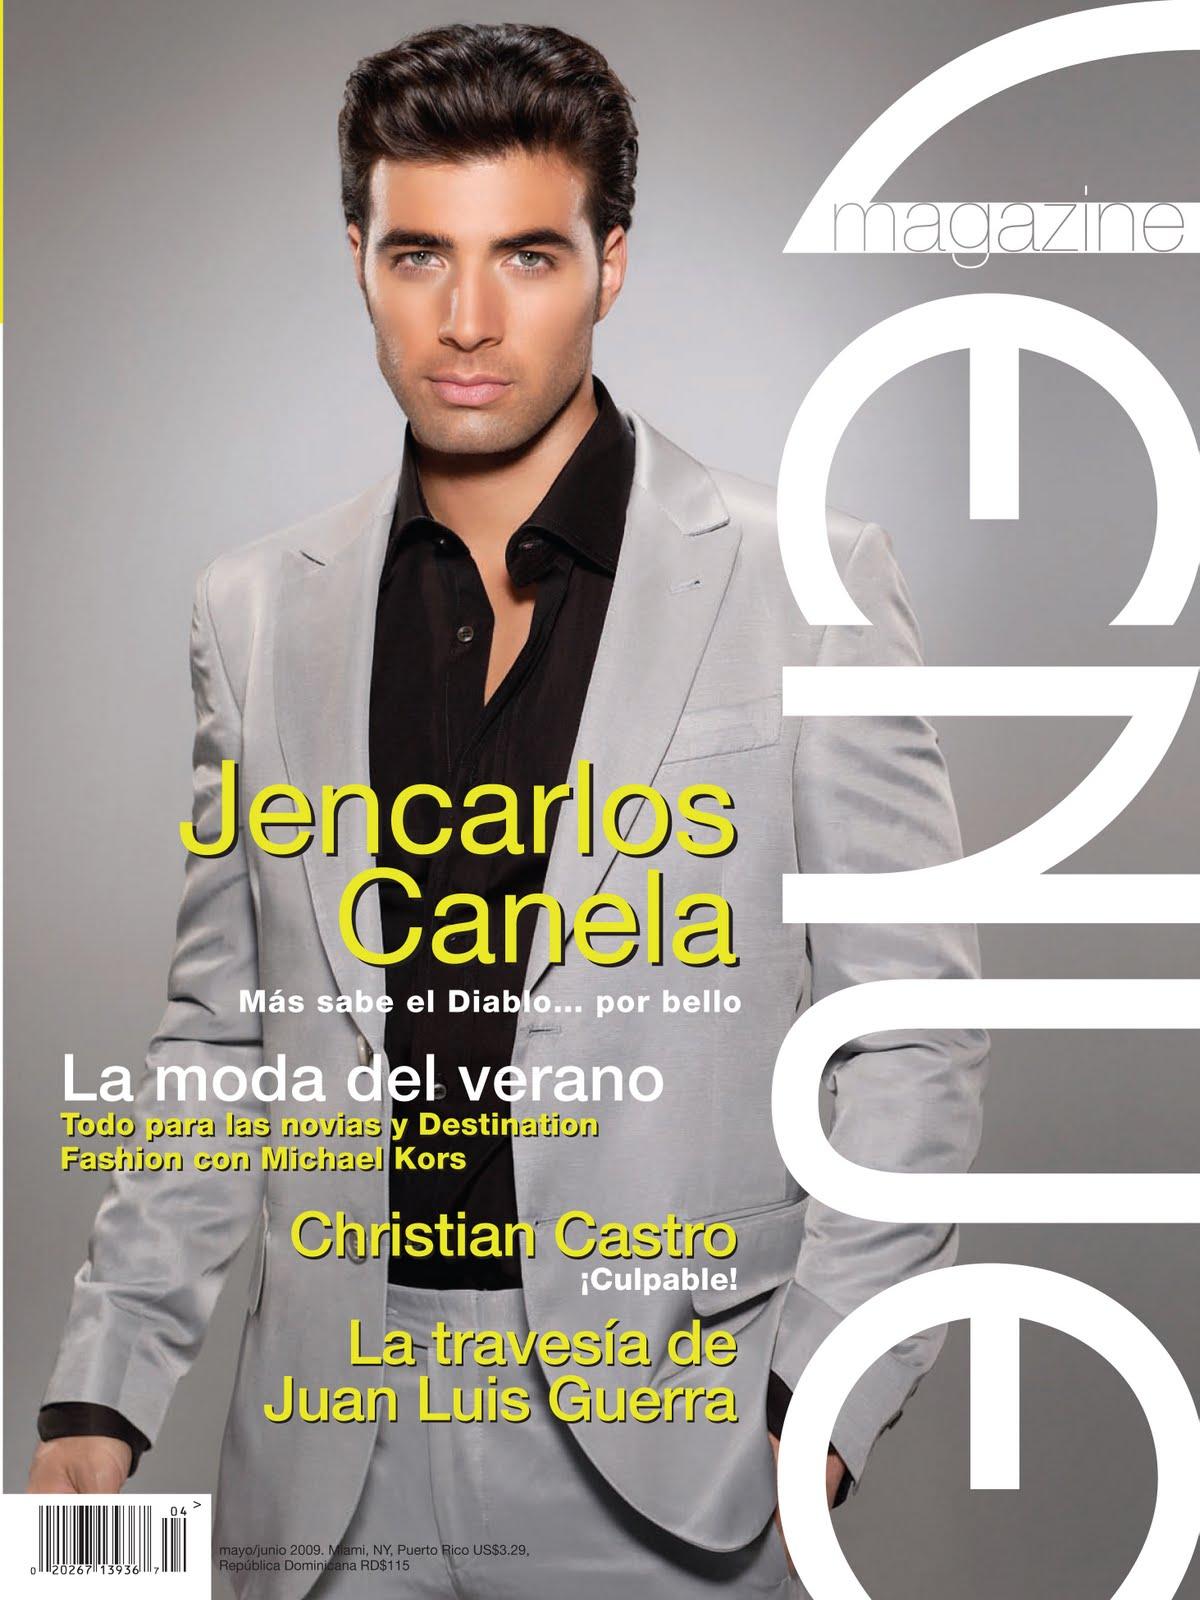 http://3.bp.blogspot.com/-08zhGQ4kCKk/ThwLxEM2MvI/AAAAAAAAAPA/VcEH58sElqI/s1600/Jencarlos+Canela+Venue.jpg